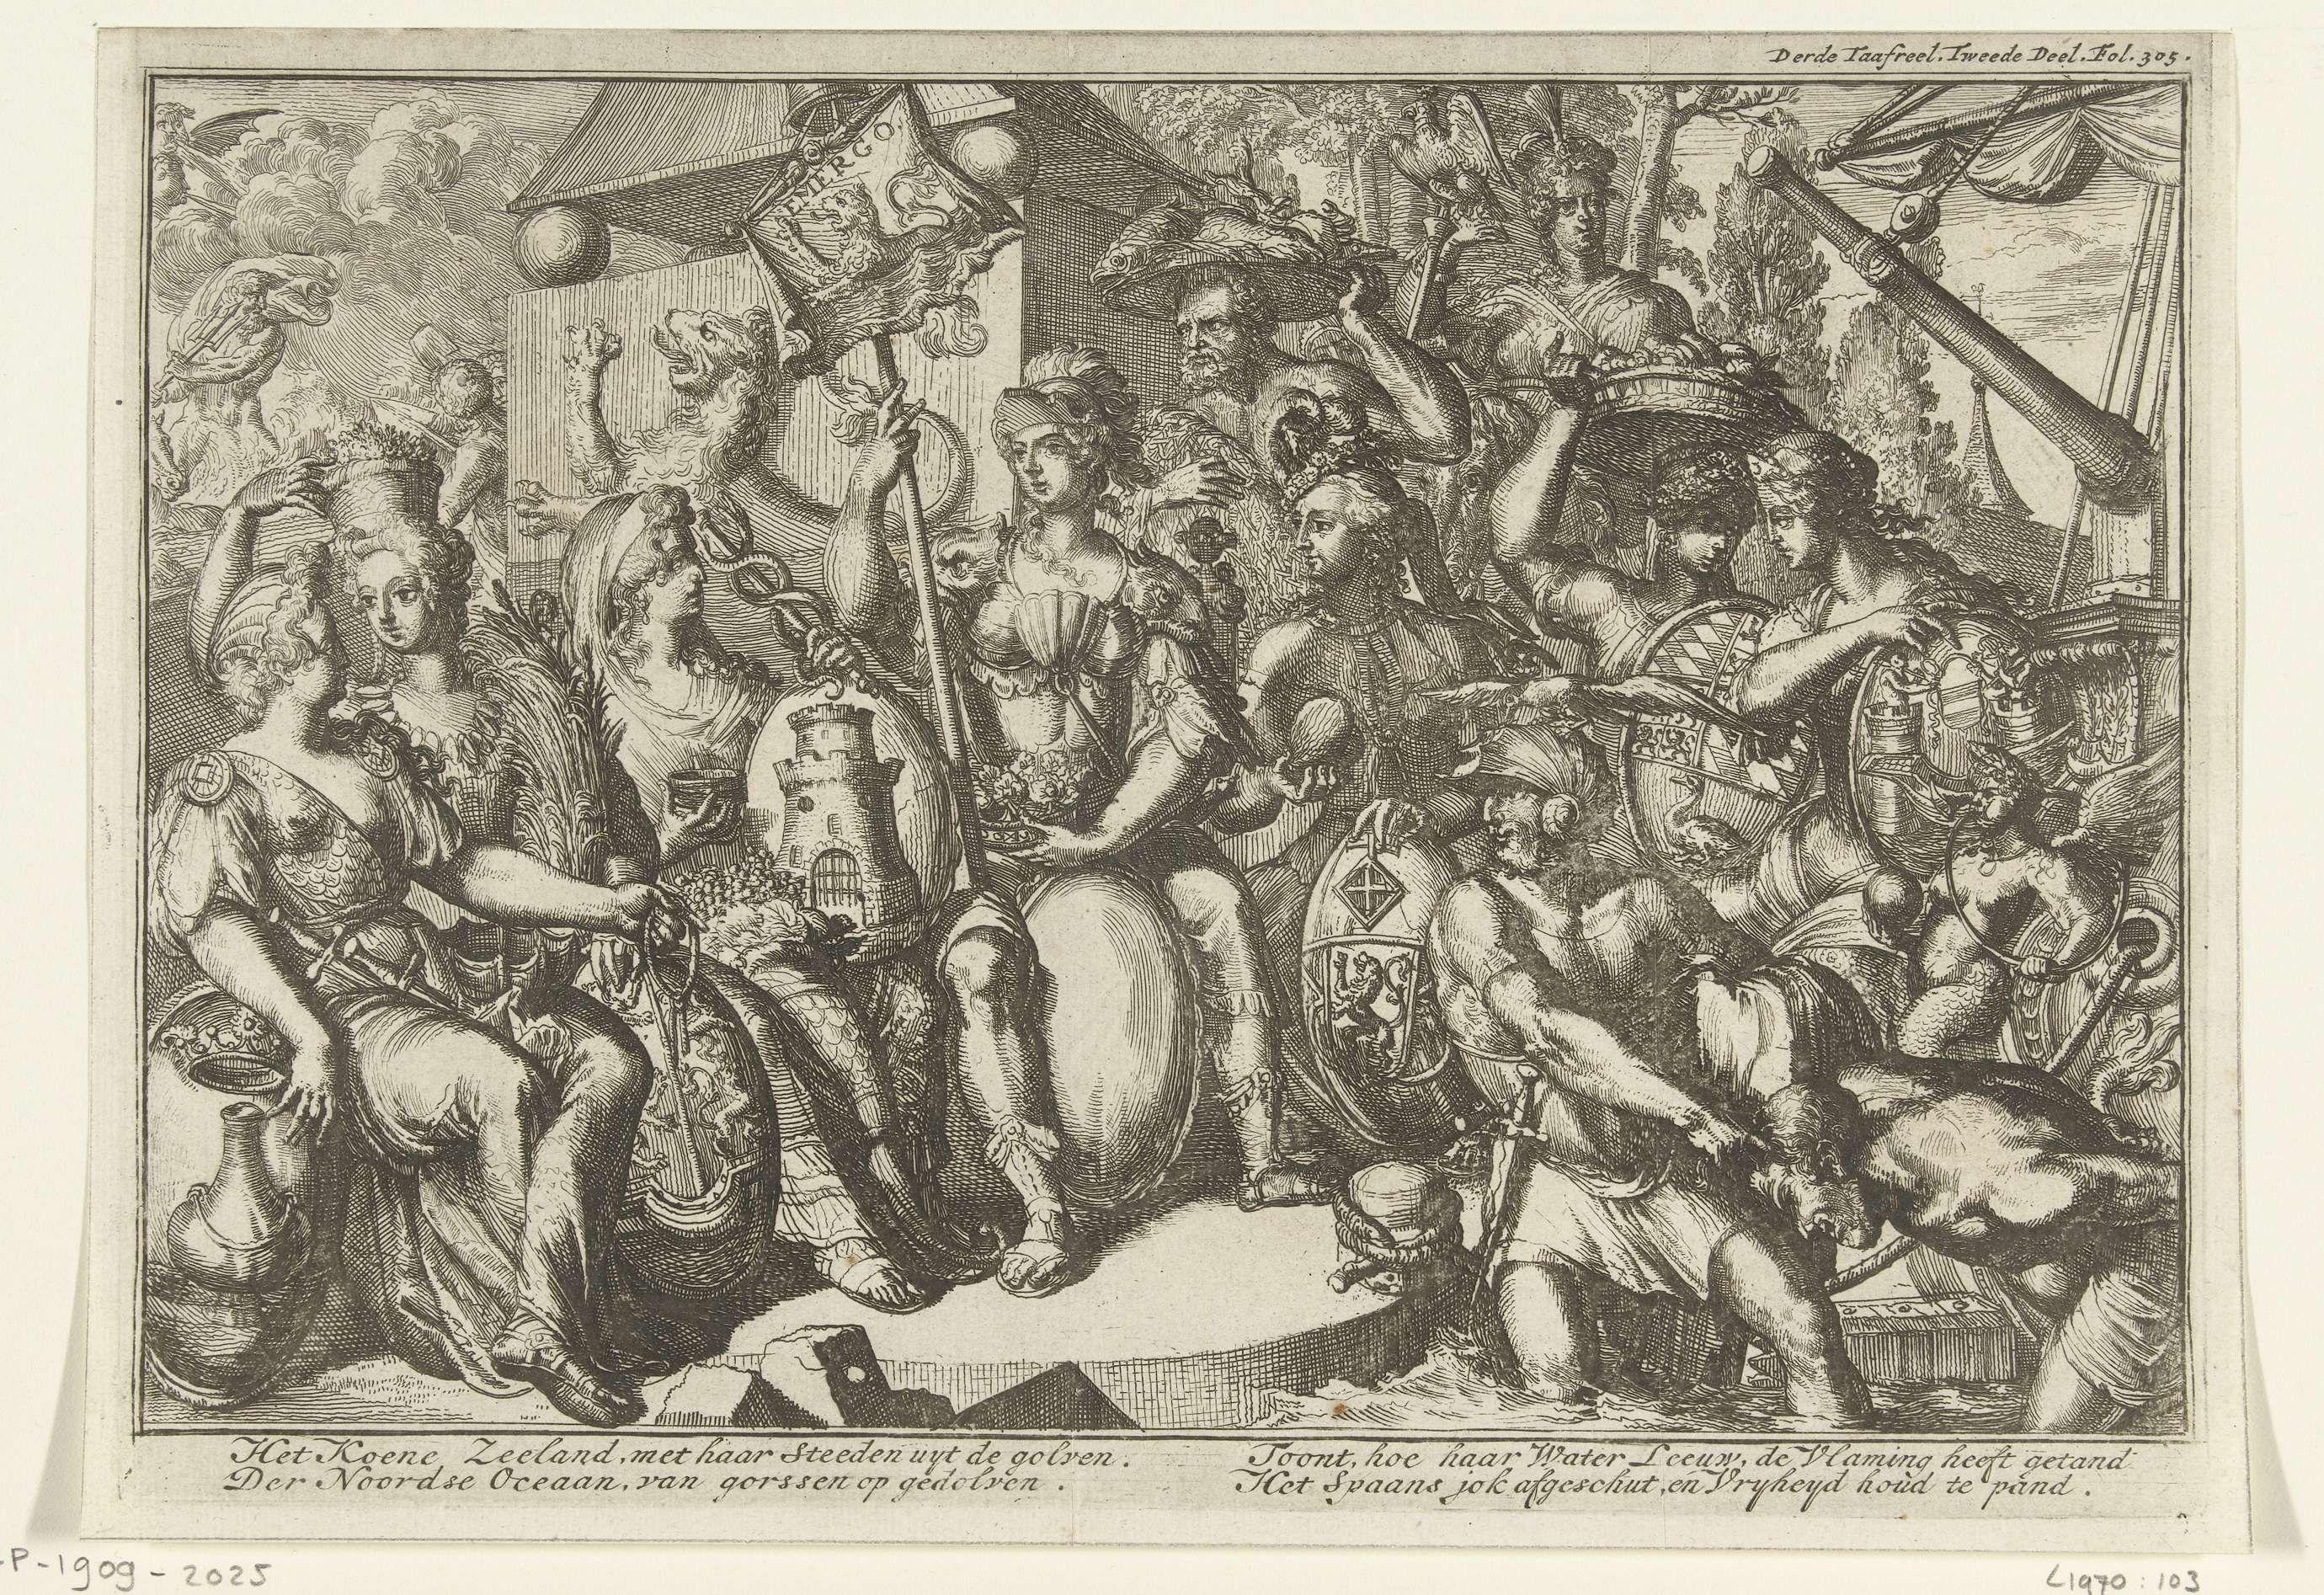 Romeyn de Hooghe   Allegorie met Zeeland, Romeyn de Hooghe, 1704 - 1706  